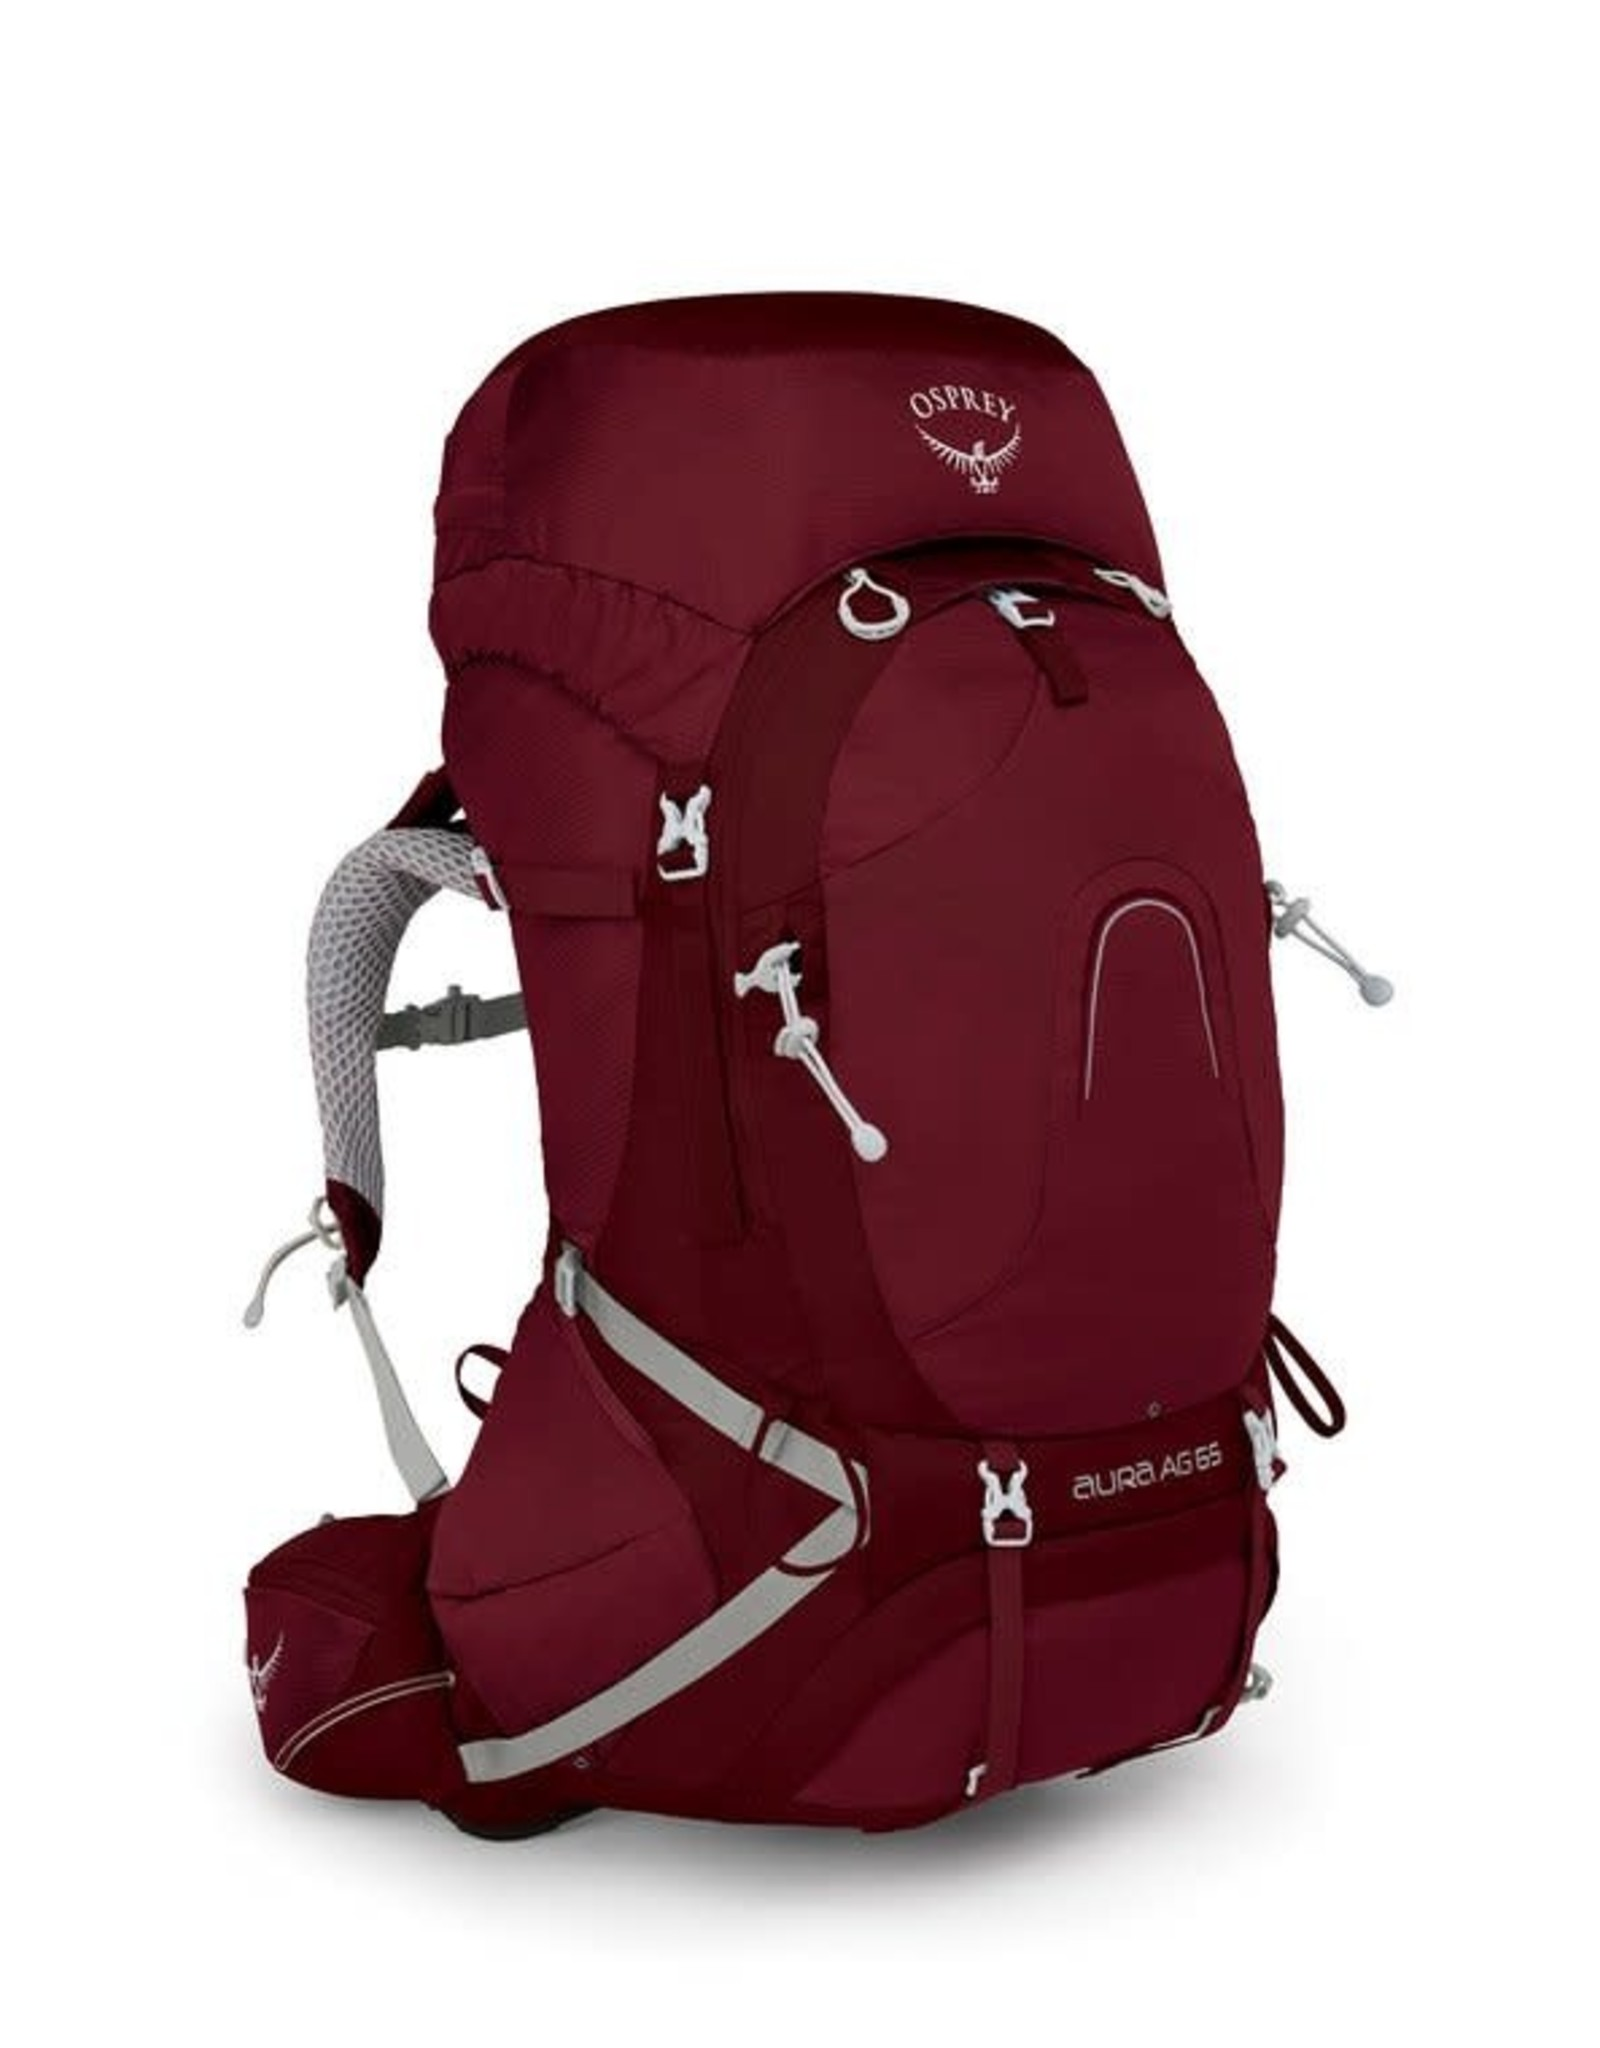 Osprey Osprey Aura 65 AG Medium Backpack Gamma Red